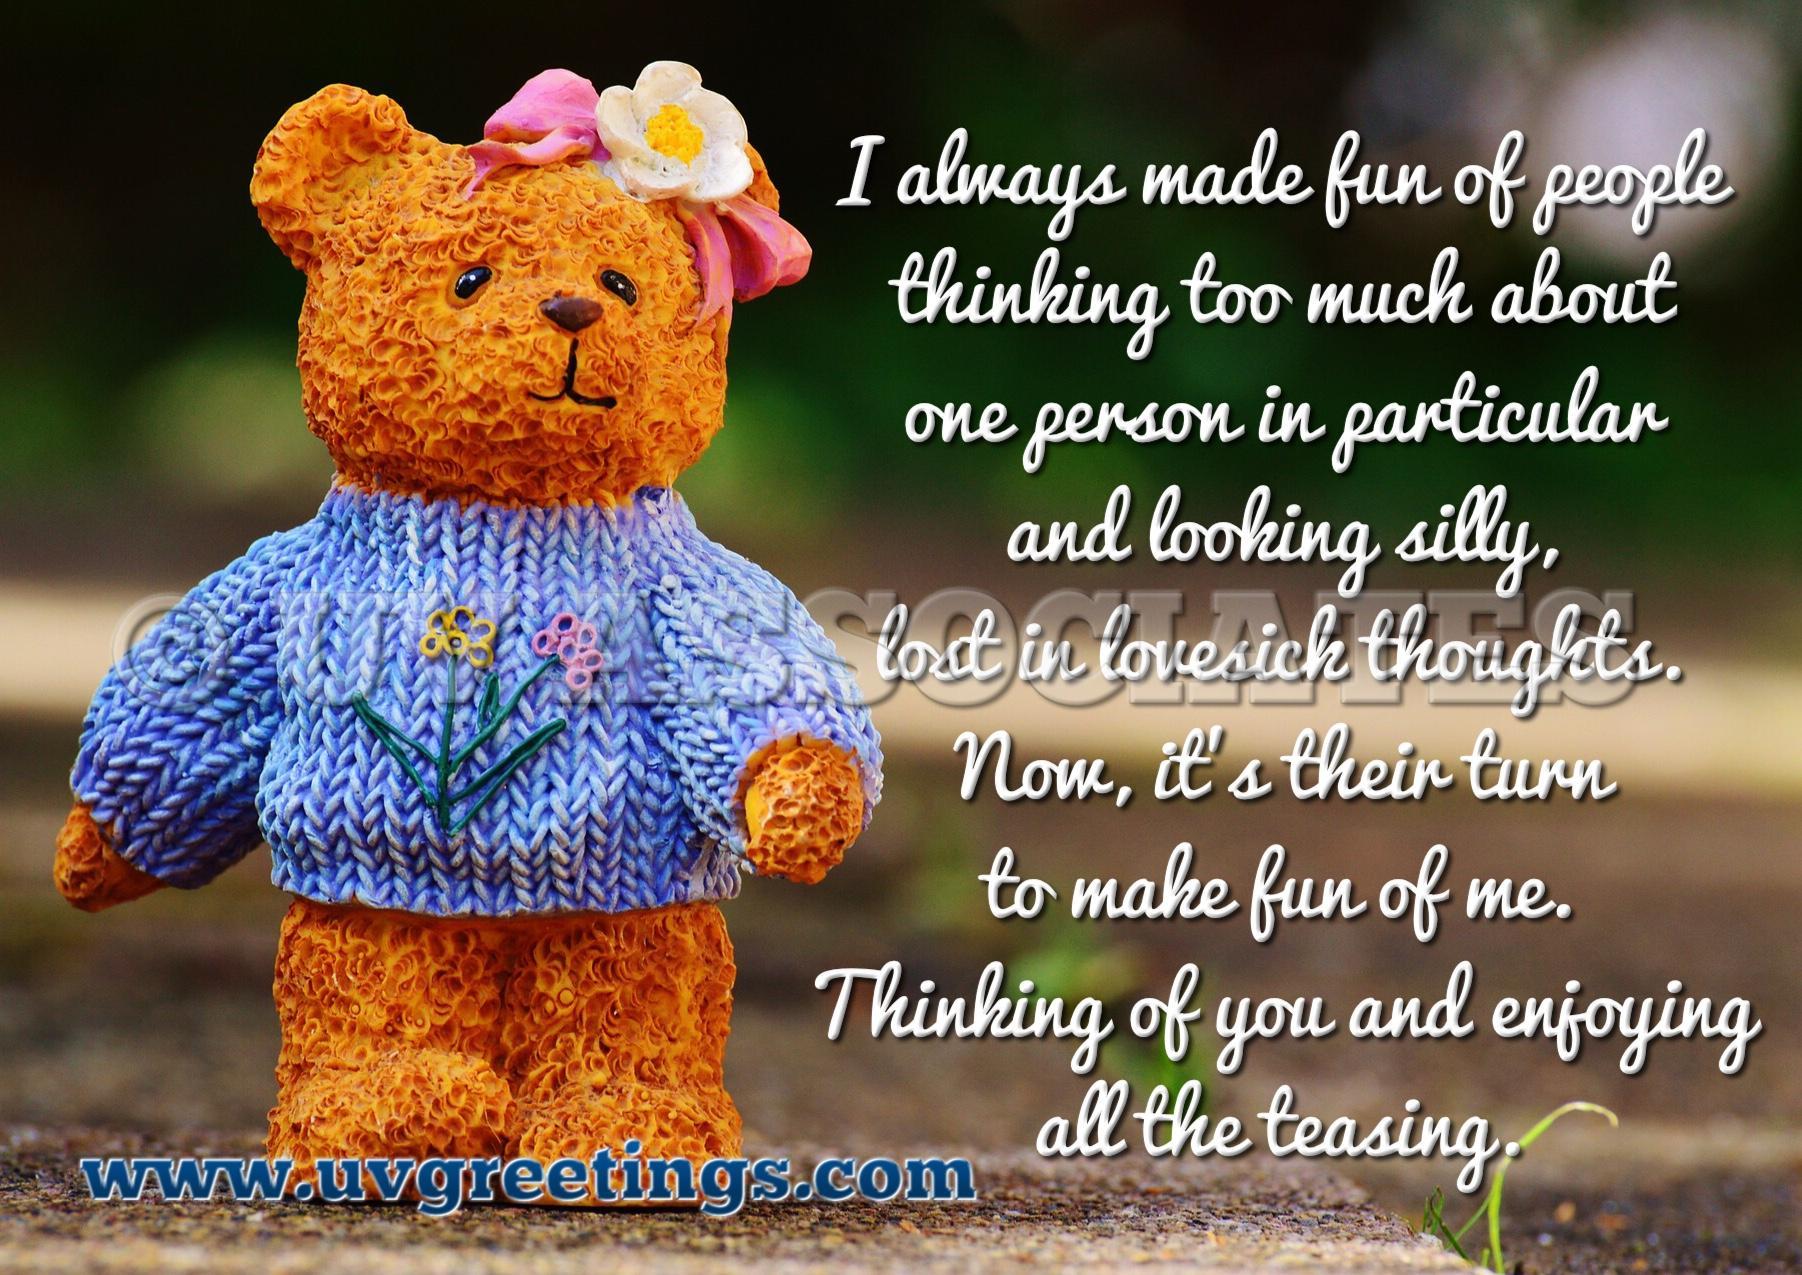 Thinking of you eCard - Cute Teddy - 'Lovesick look' making everyone tease